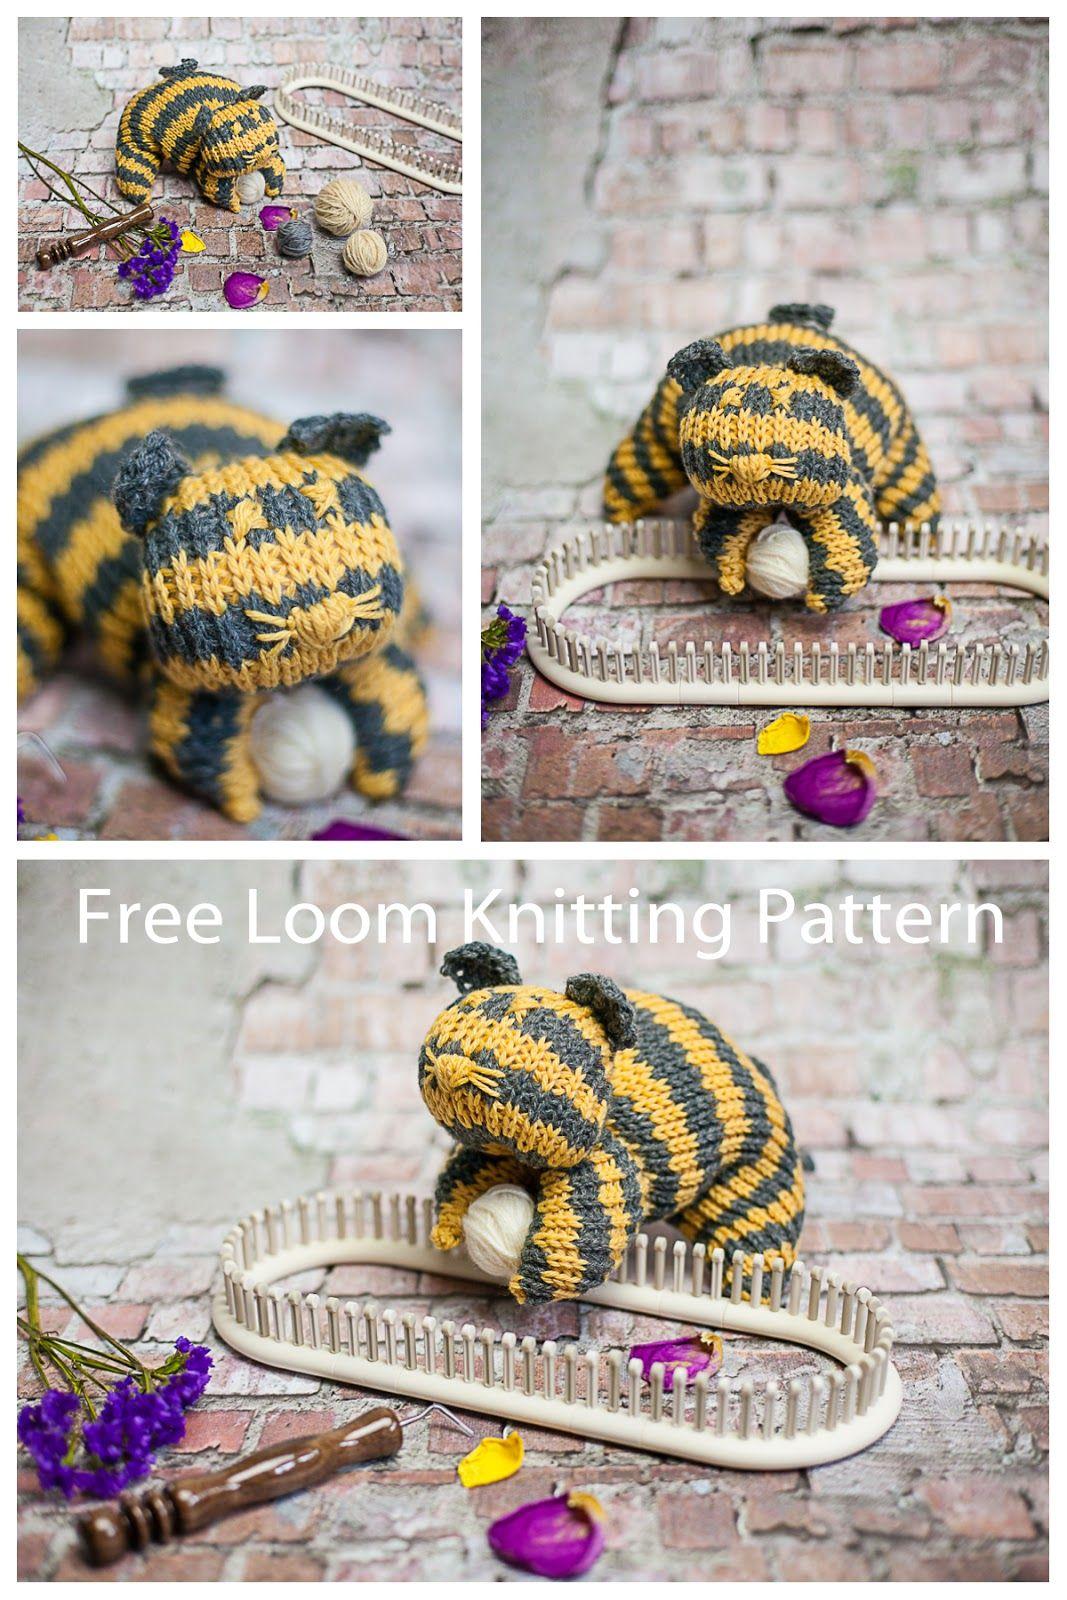 Loom Knit Cat Pattern (Free) | Loom knitting patterns, Loom knitting ...